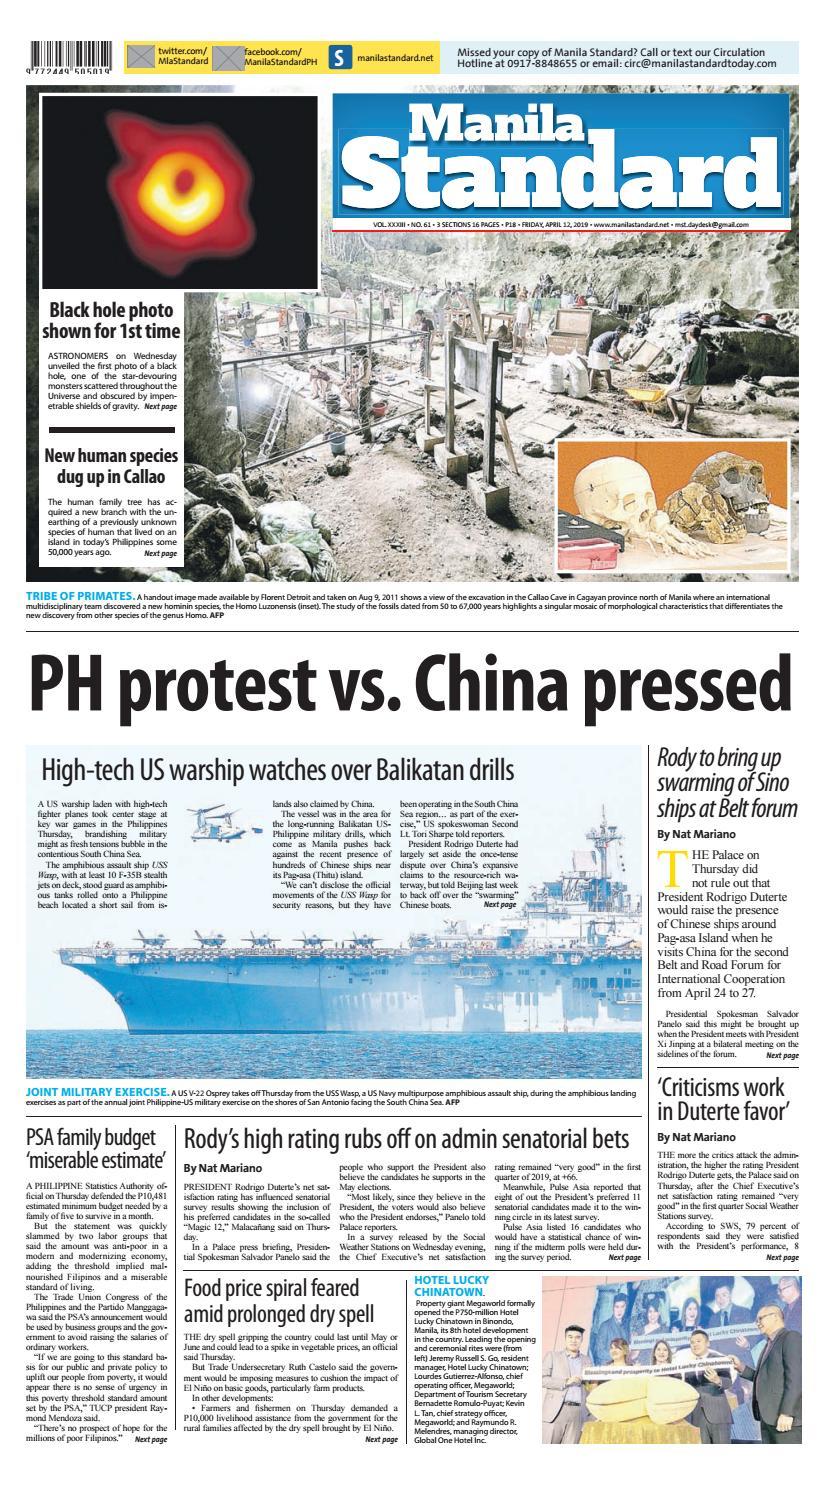 Manila Standard - 2019 April 12 - Friday by Manila Standard